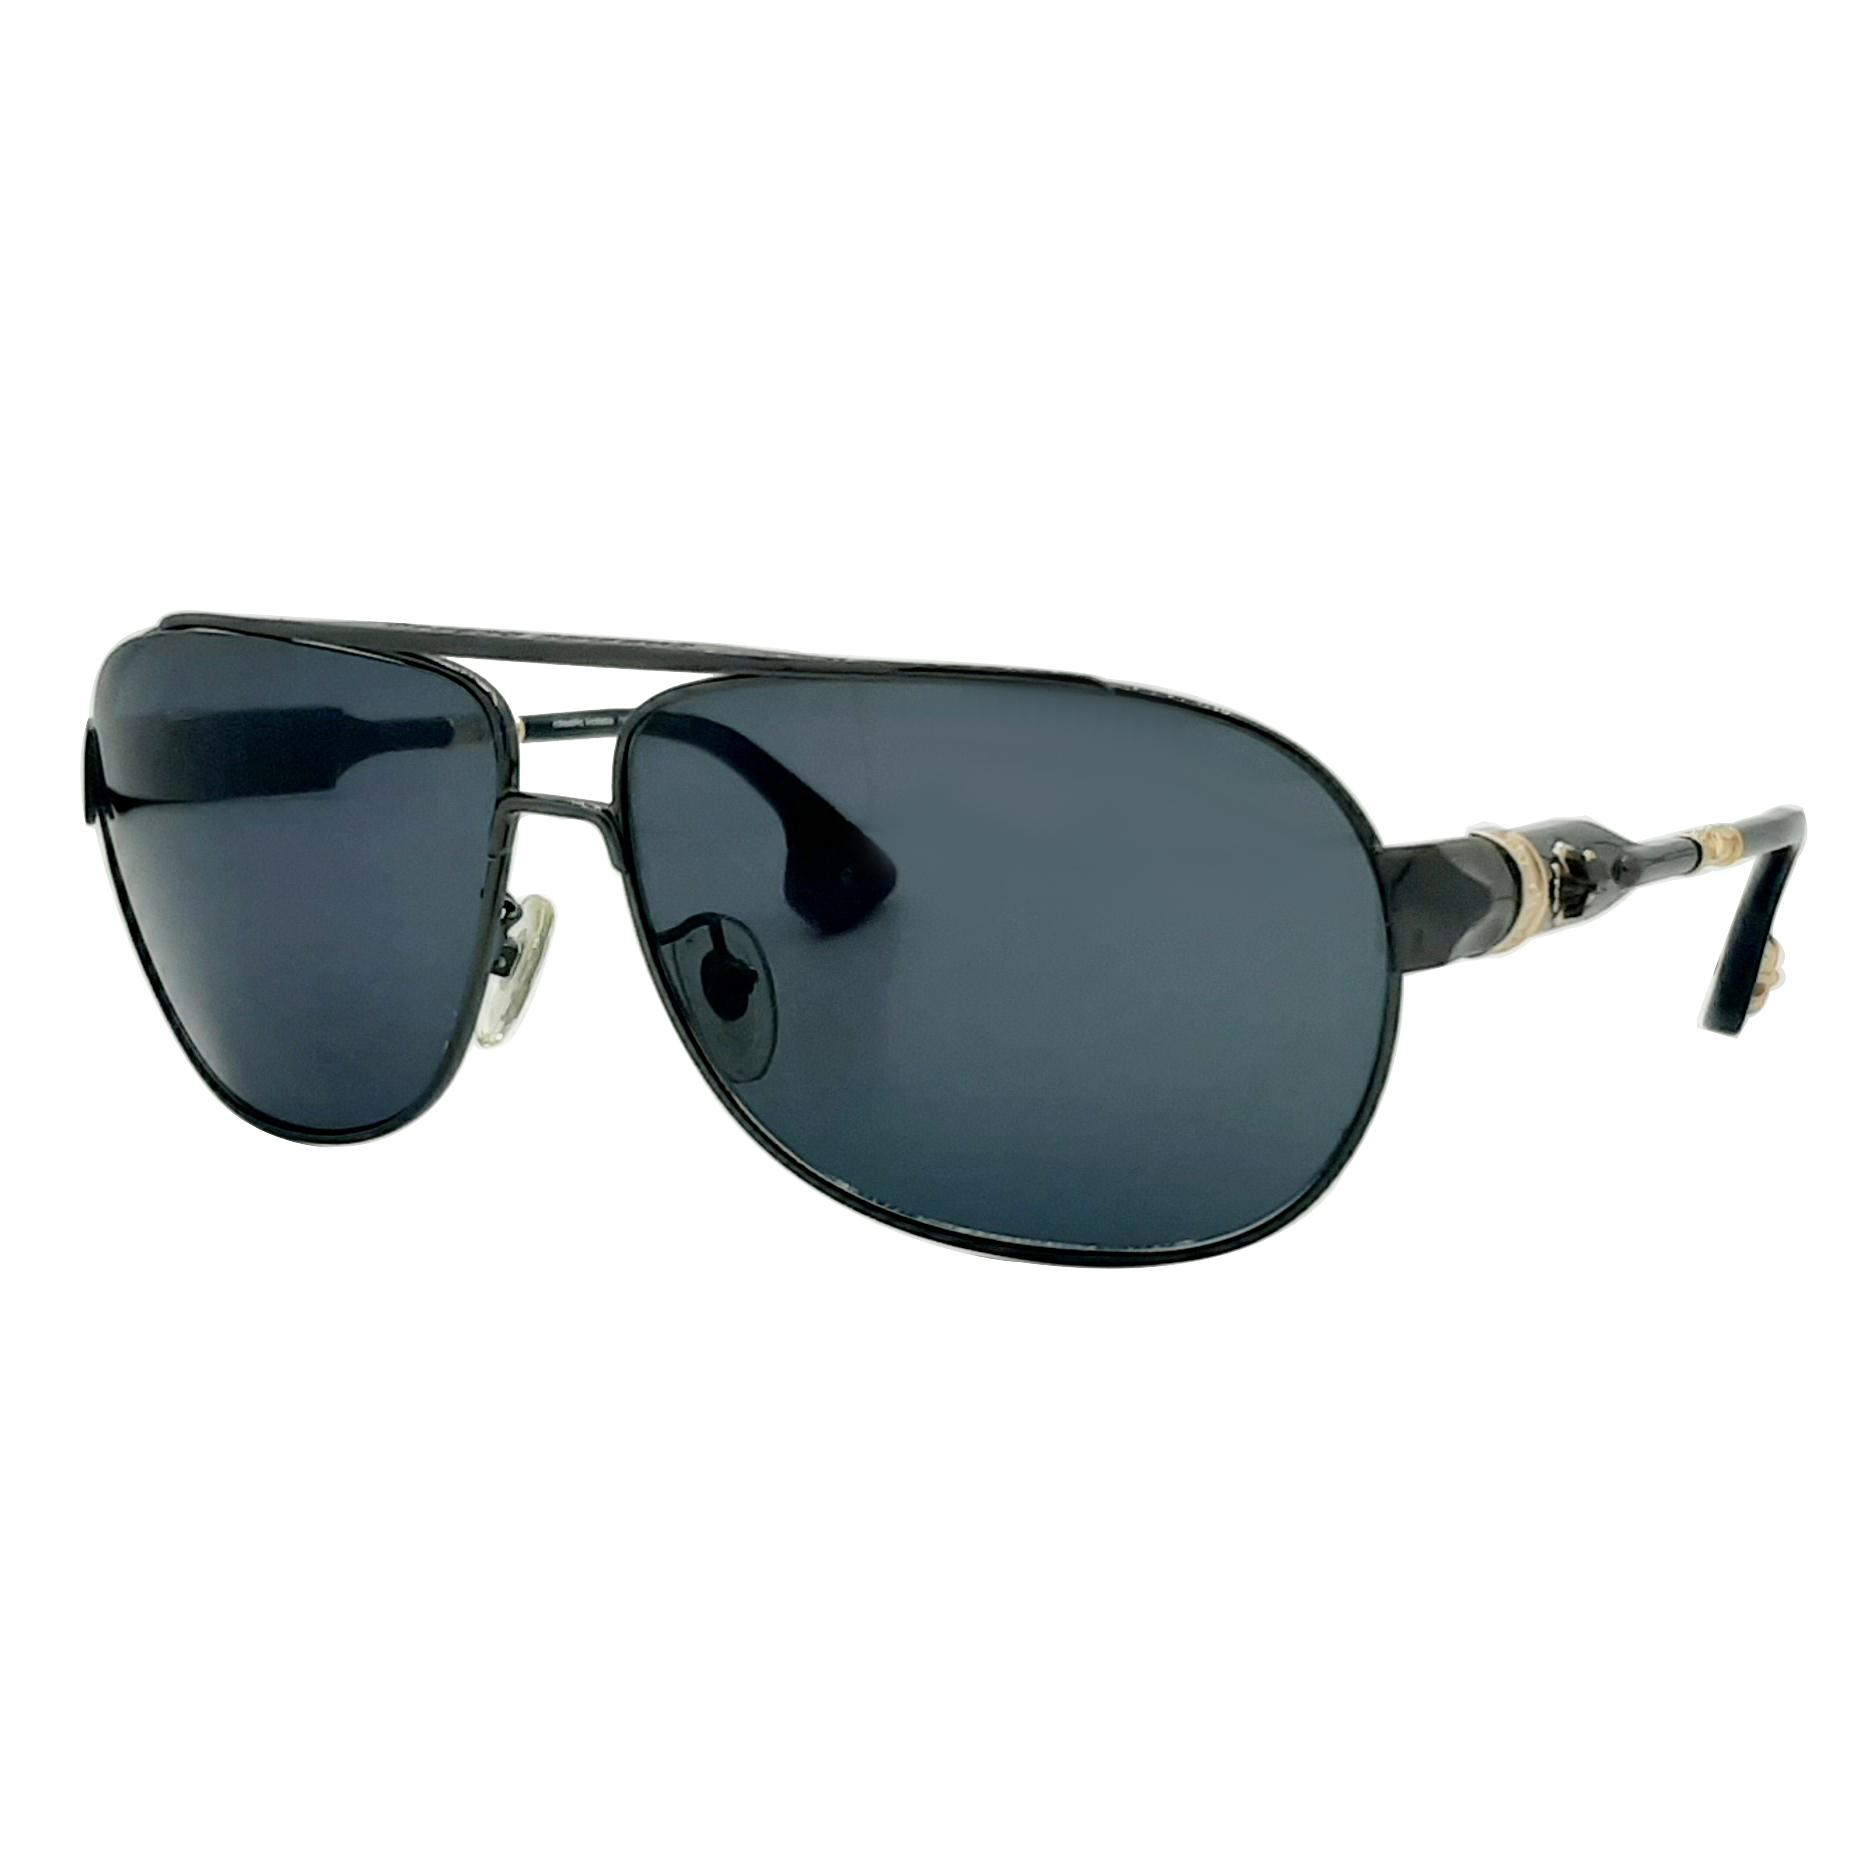 عینک آفتابی مدل BE01